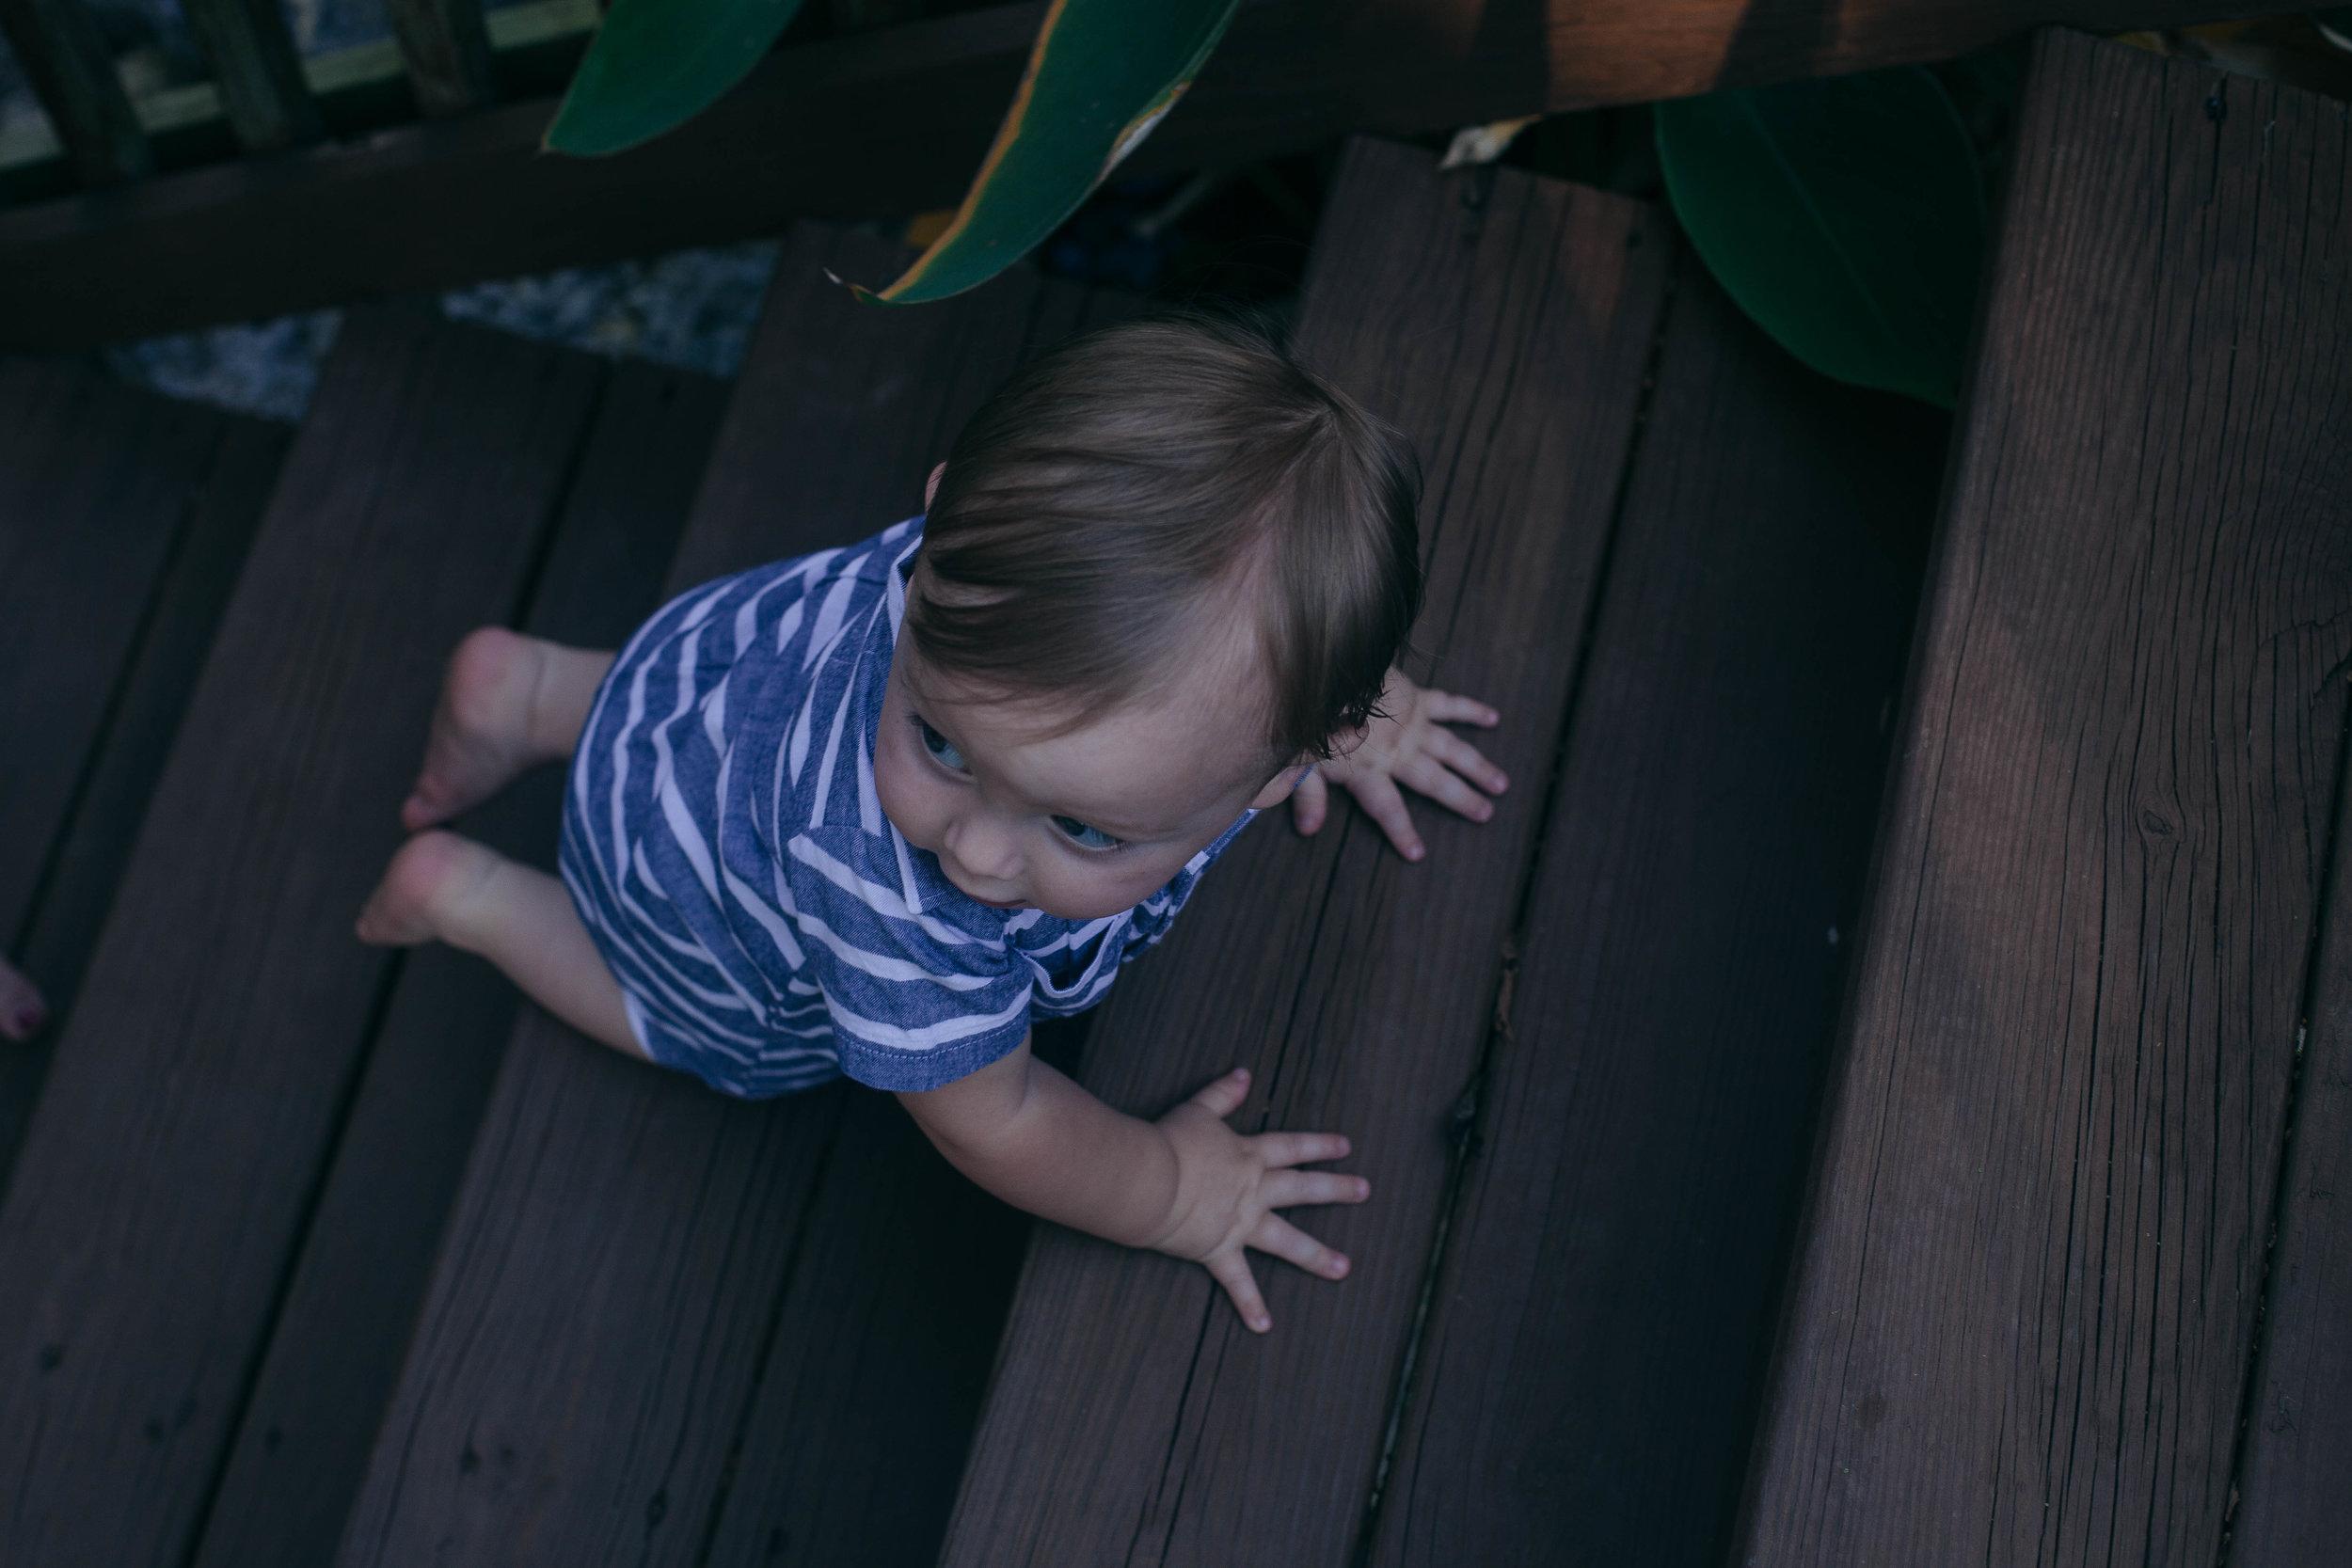 BabyBoyPortraitOutdoorTN2.jpg